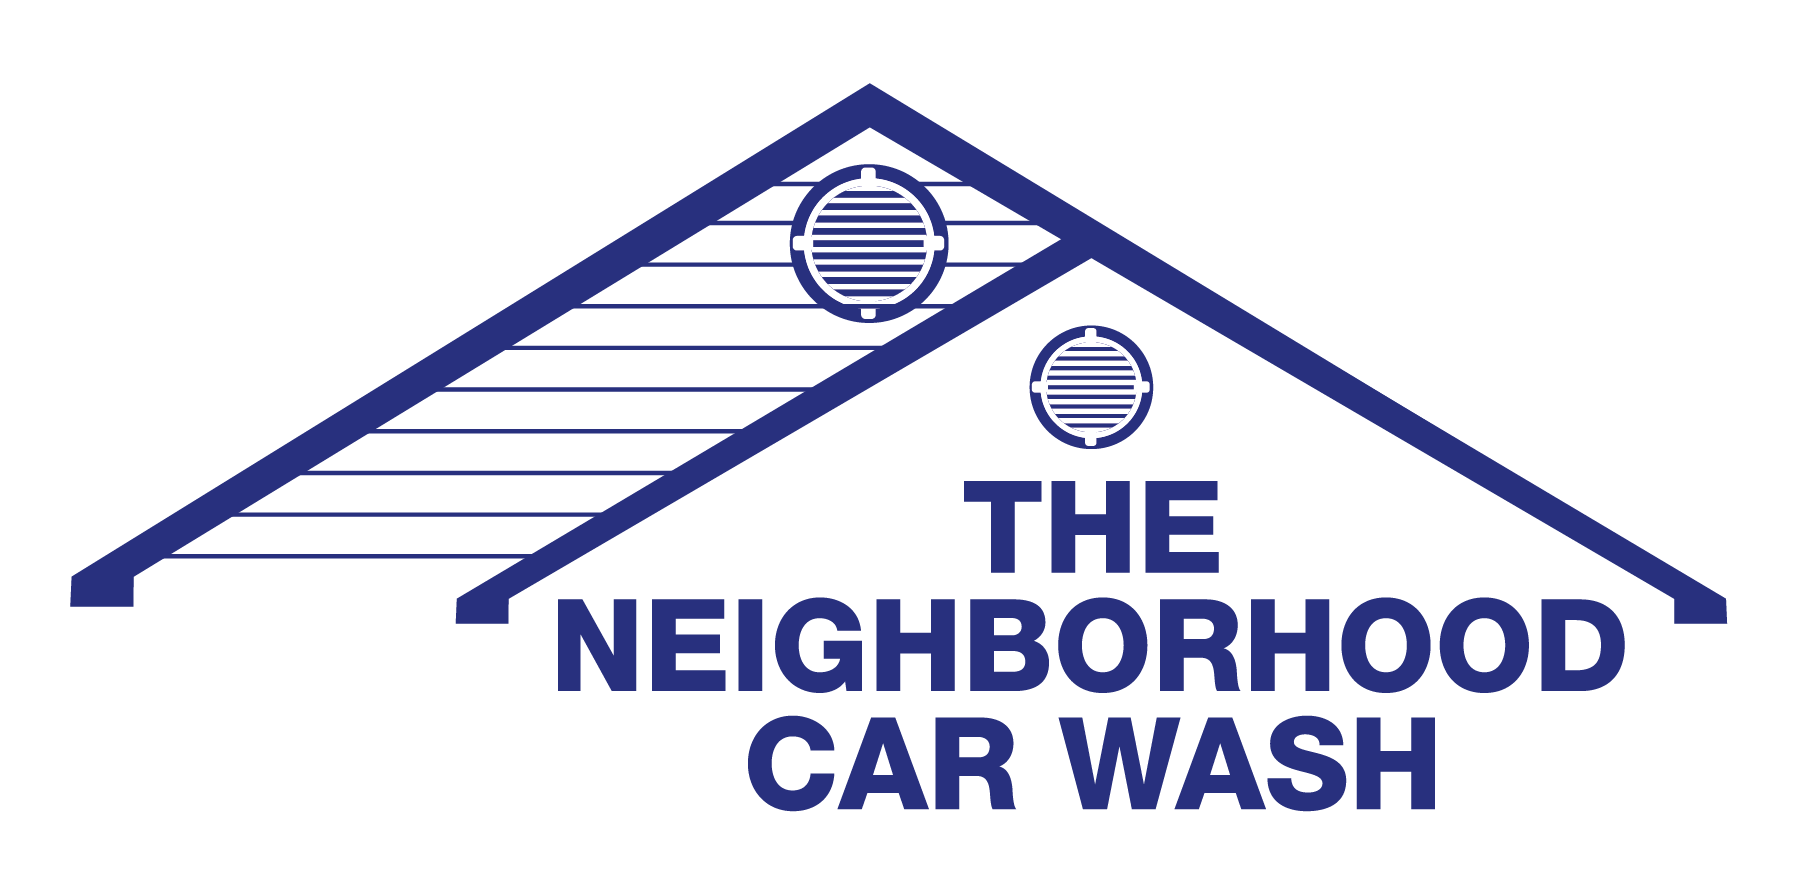 The Neighborhood Car Wash